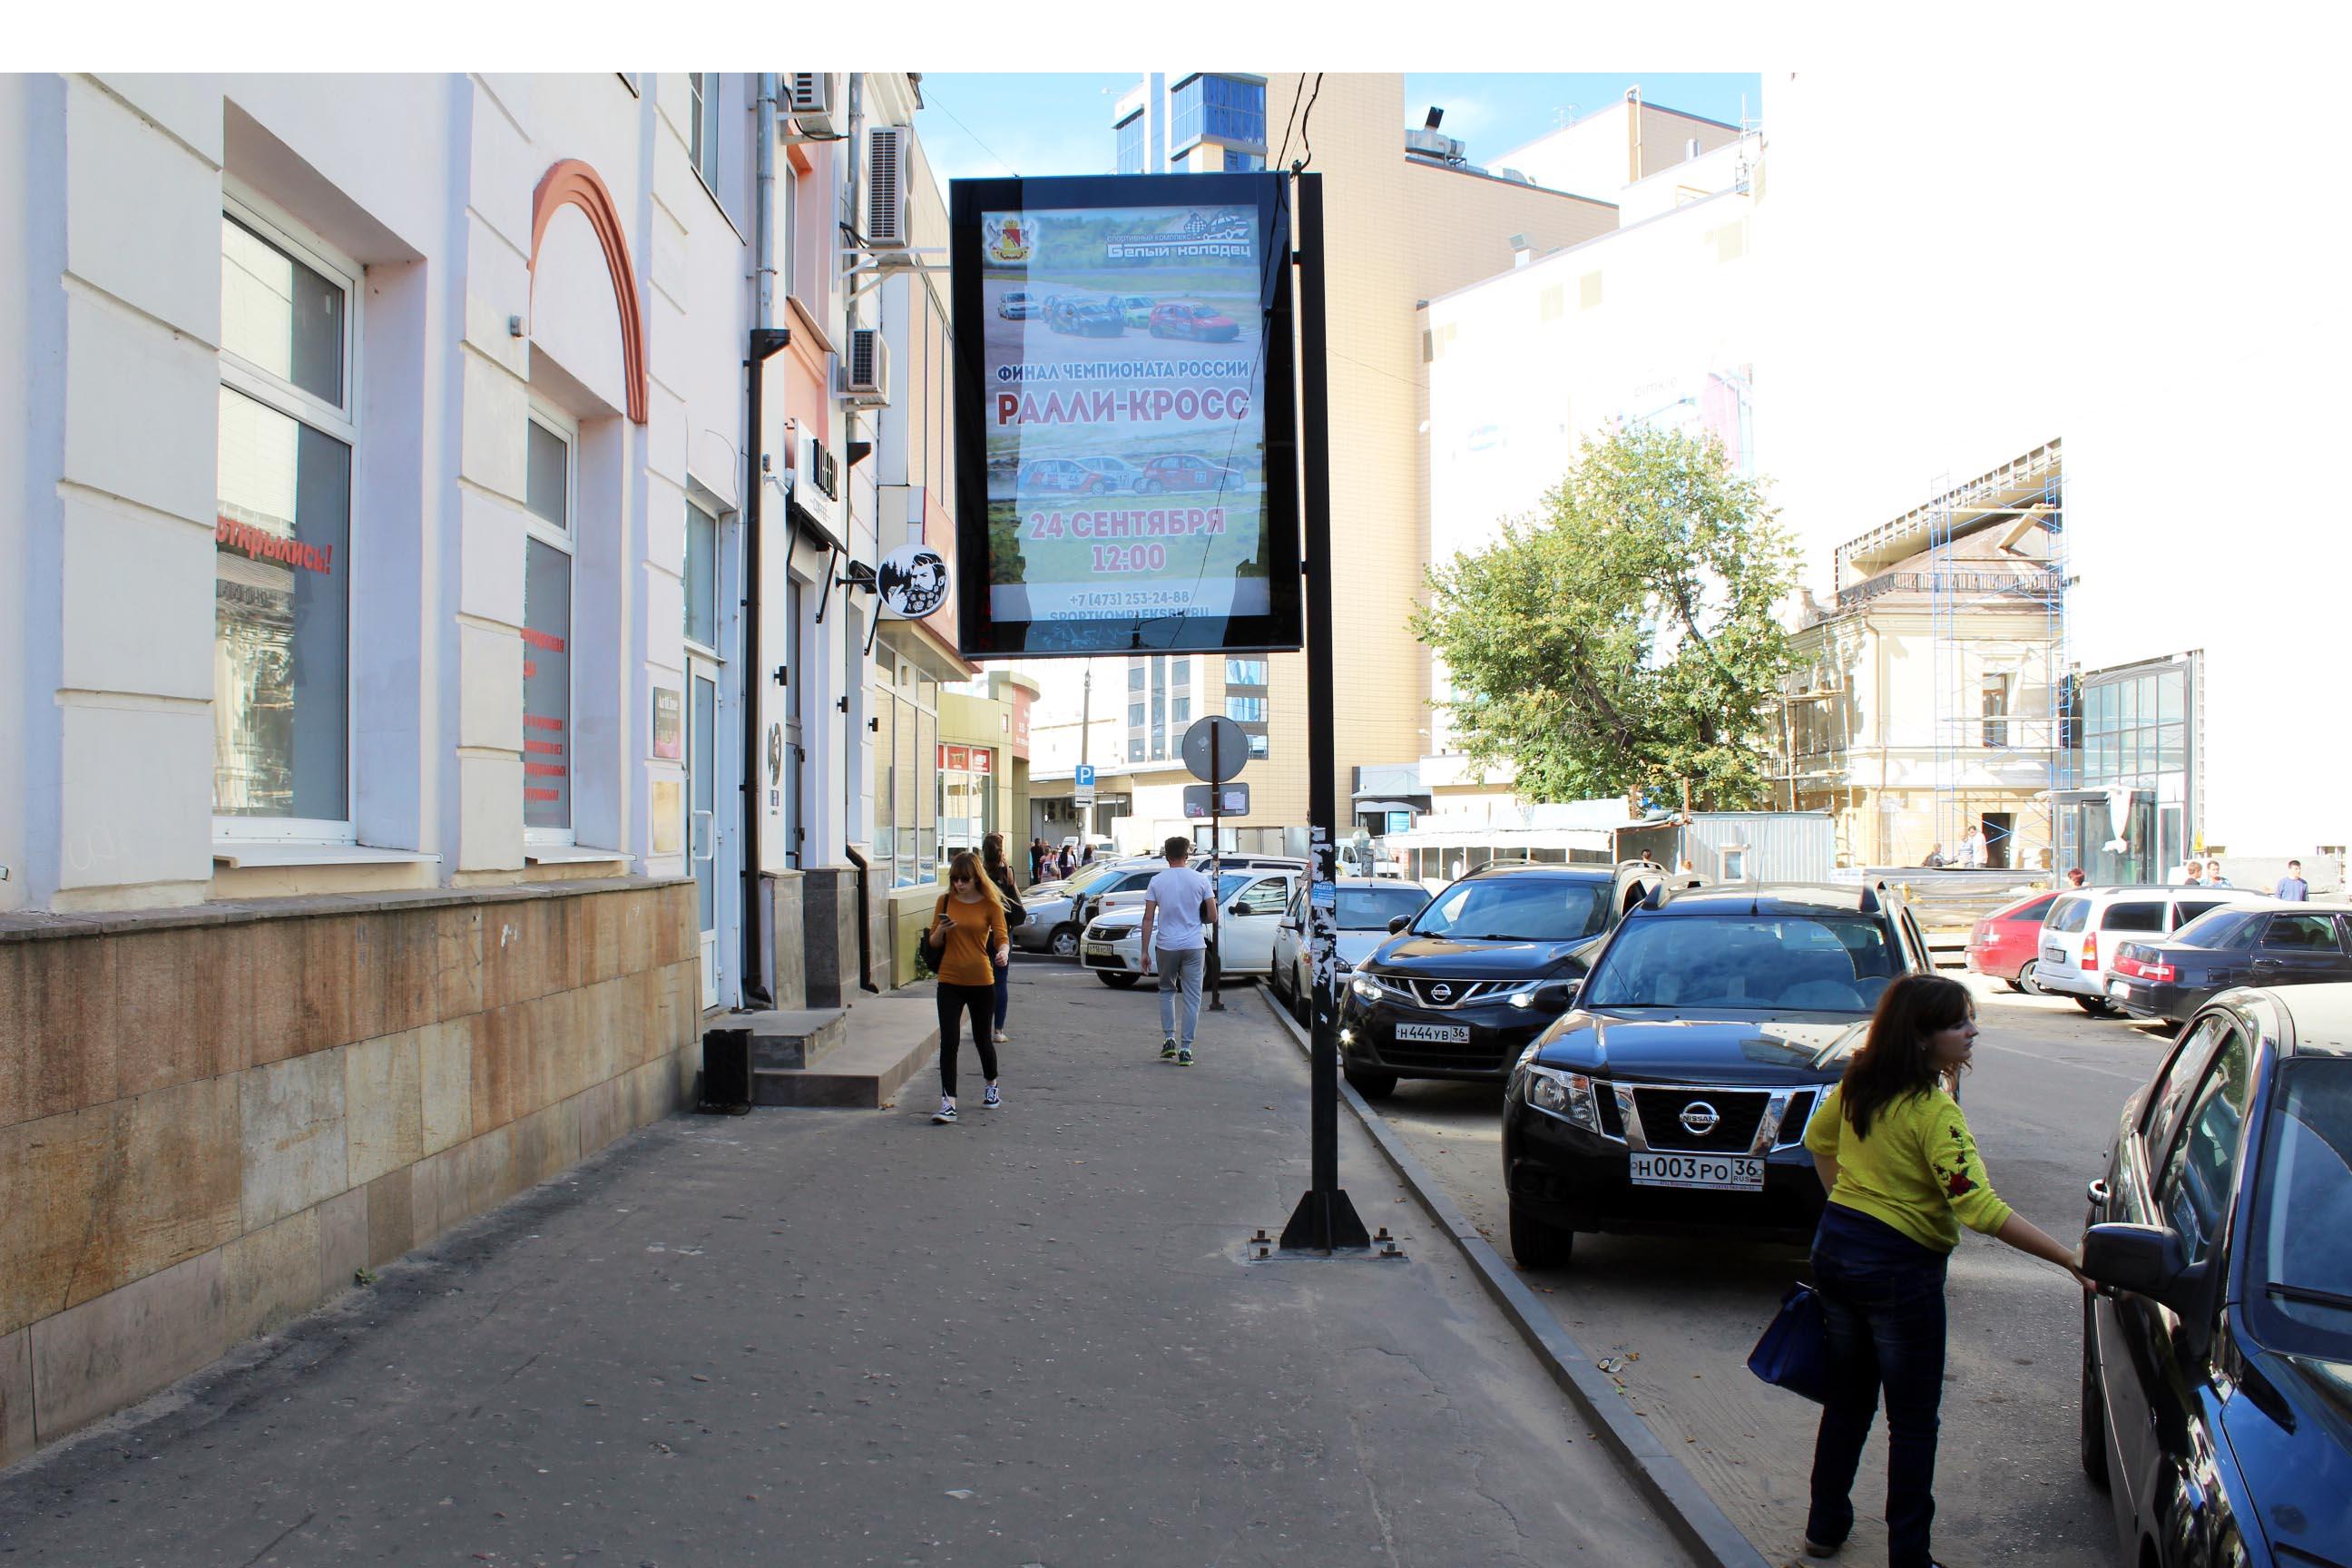 212В ул.Куколкина-ул.Никитинская, 42 ХОРЕКА (2)